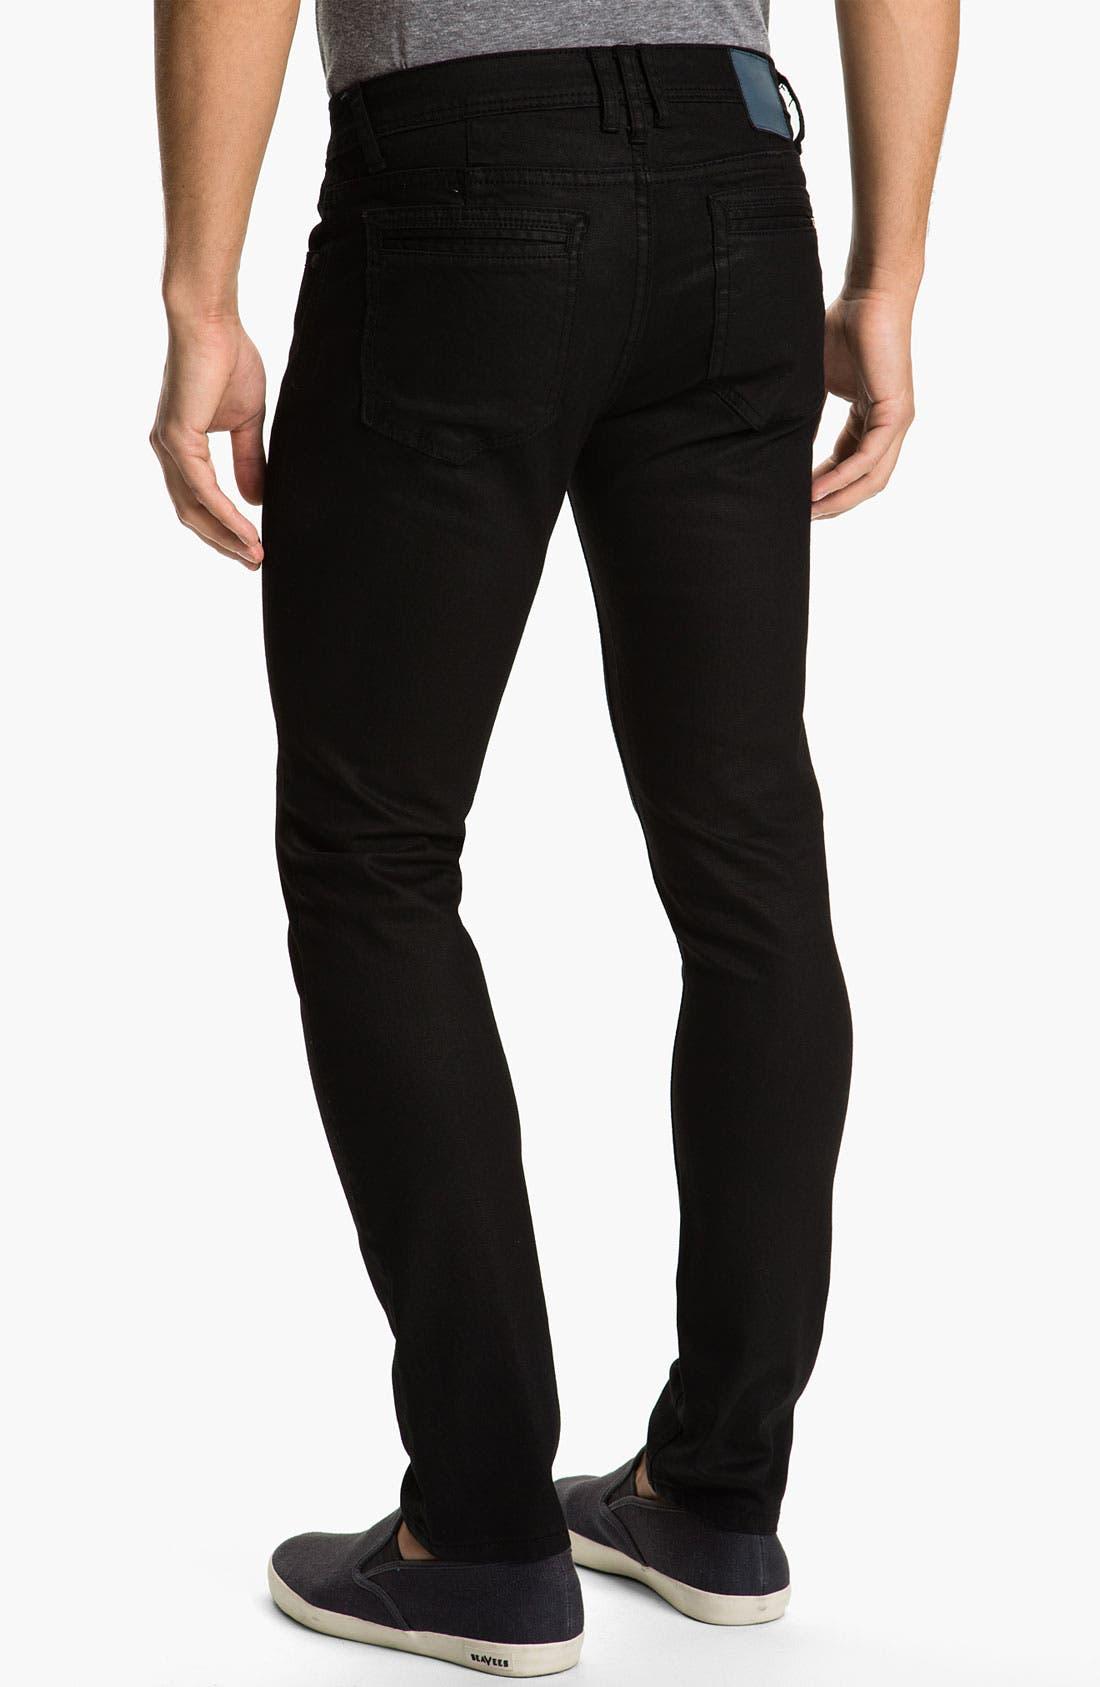 Alternate Image 1 Selected - Ezekiel 'Chopper 305' Slim Straight Leg Jeans (Black)